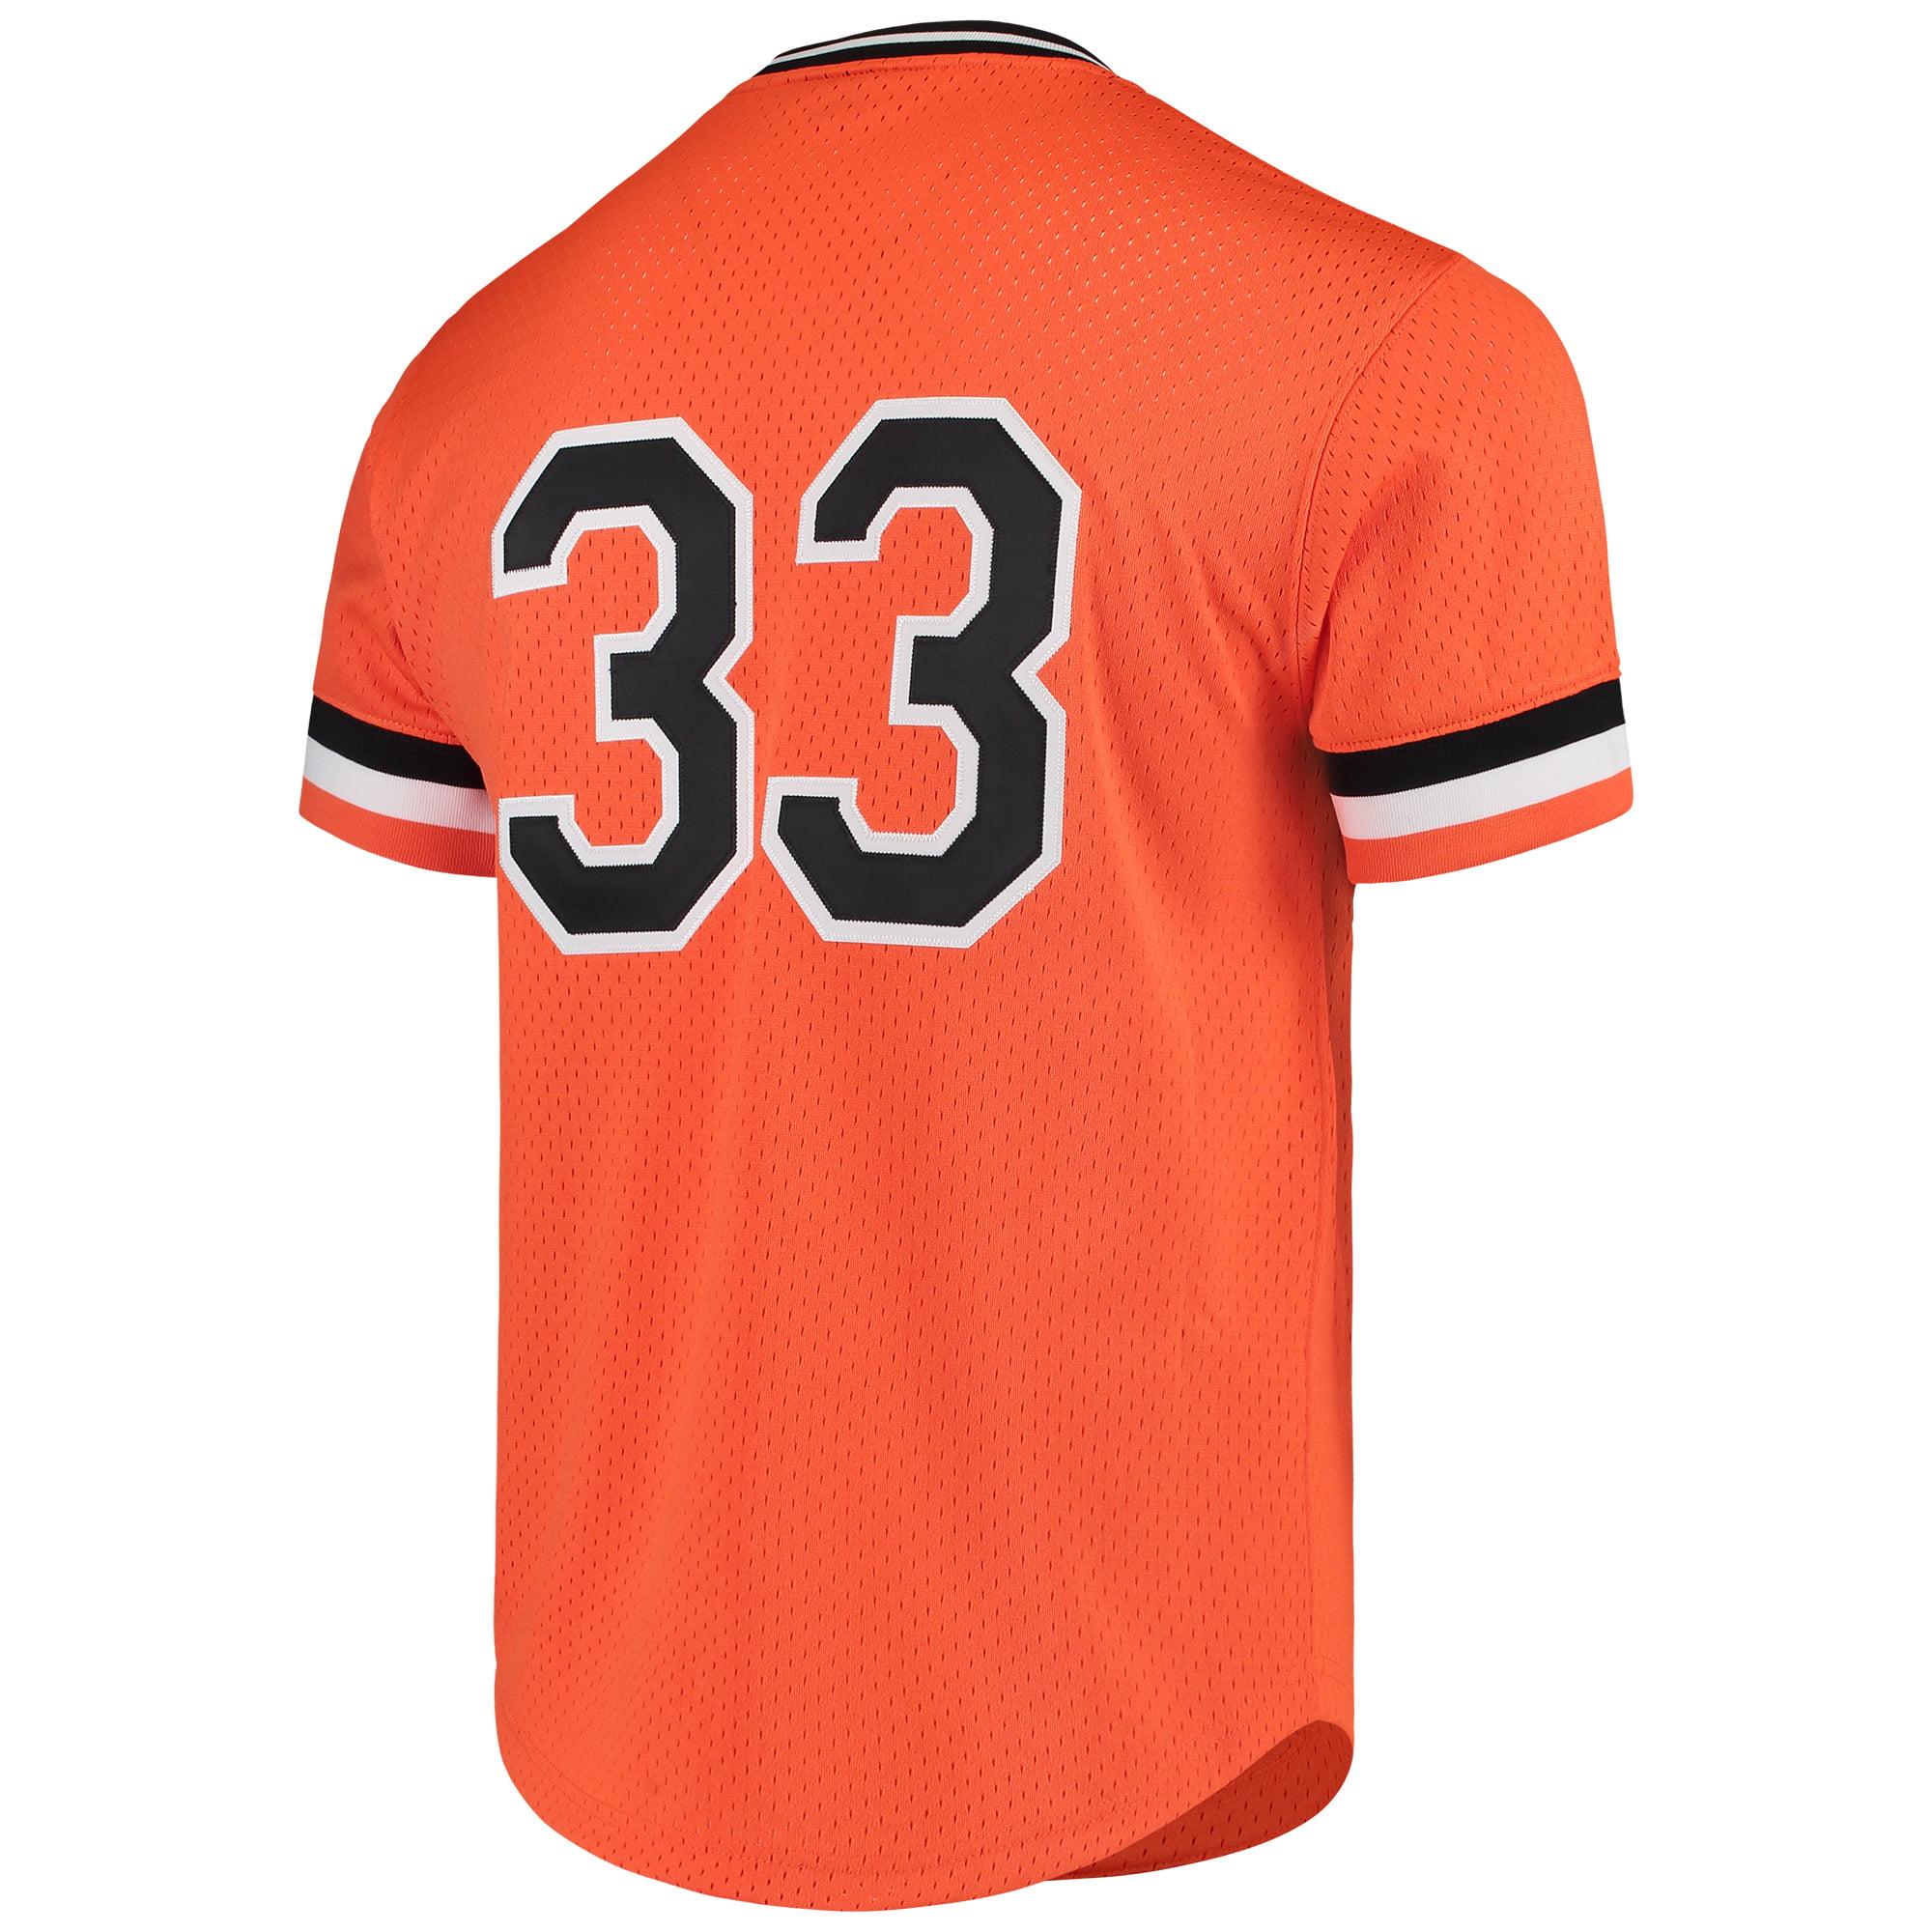 d2eaf78a8 Eddie Murray Baltimore Orioles Mitchell   Ness Cooperstown Mesh Batting  Practice Jersey - Orange - Walmart.com